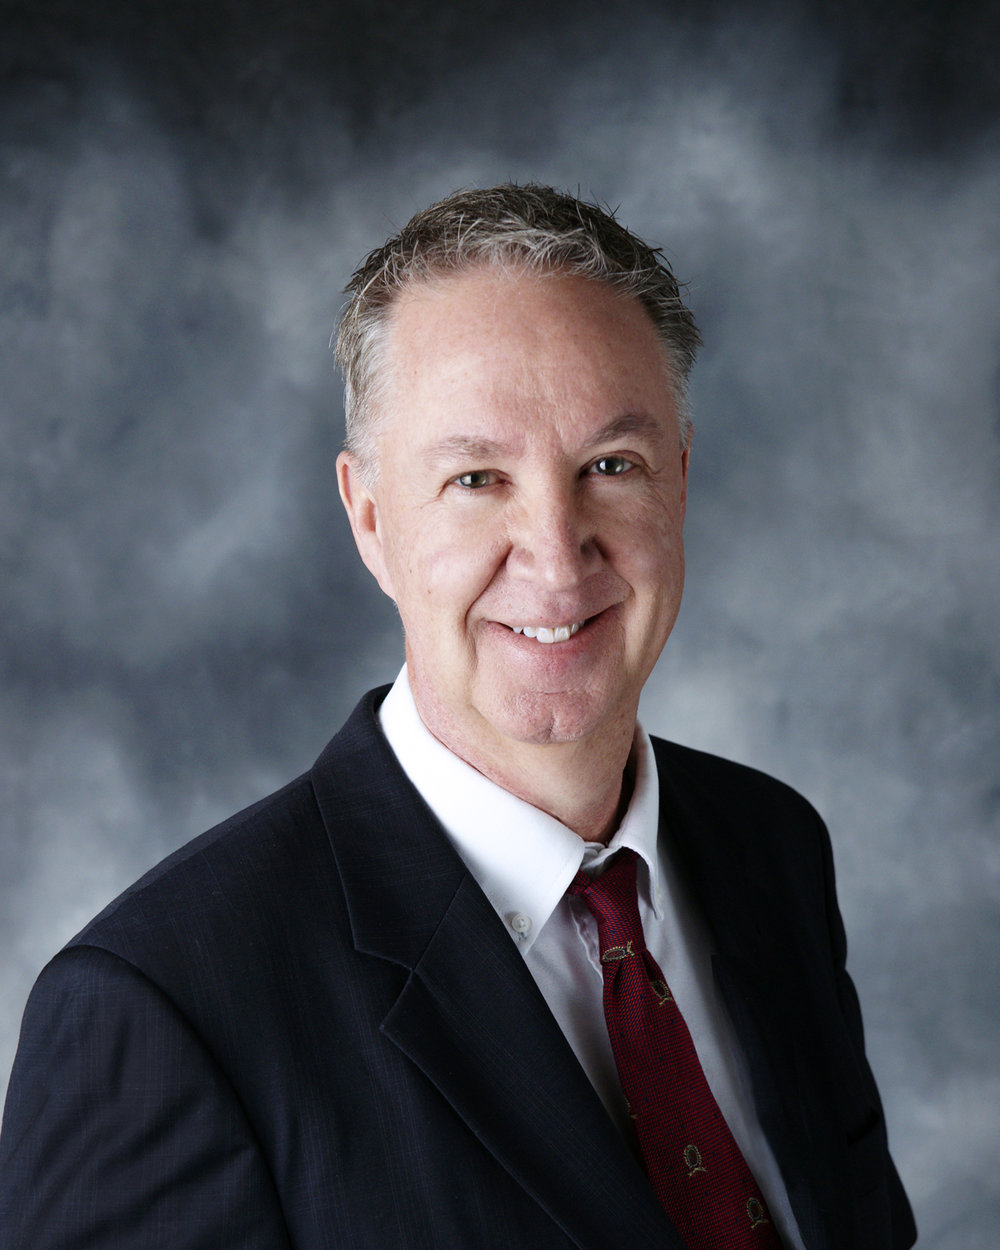 William Perry Baker, PhD Associate Dean of Academic Affairs Tel: (208) 810-7815 wbaker@idahocom.org